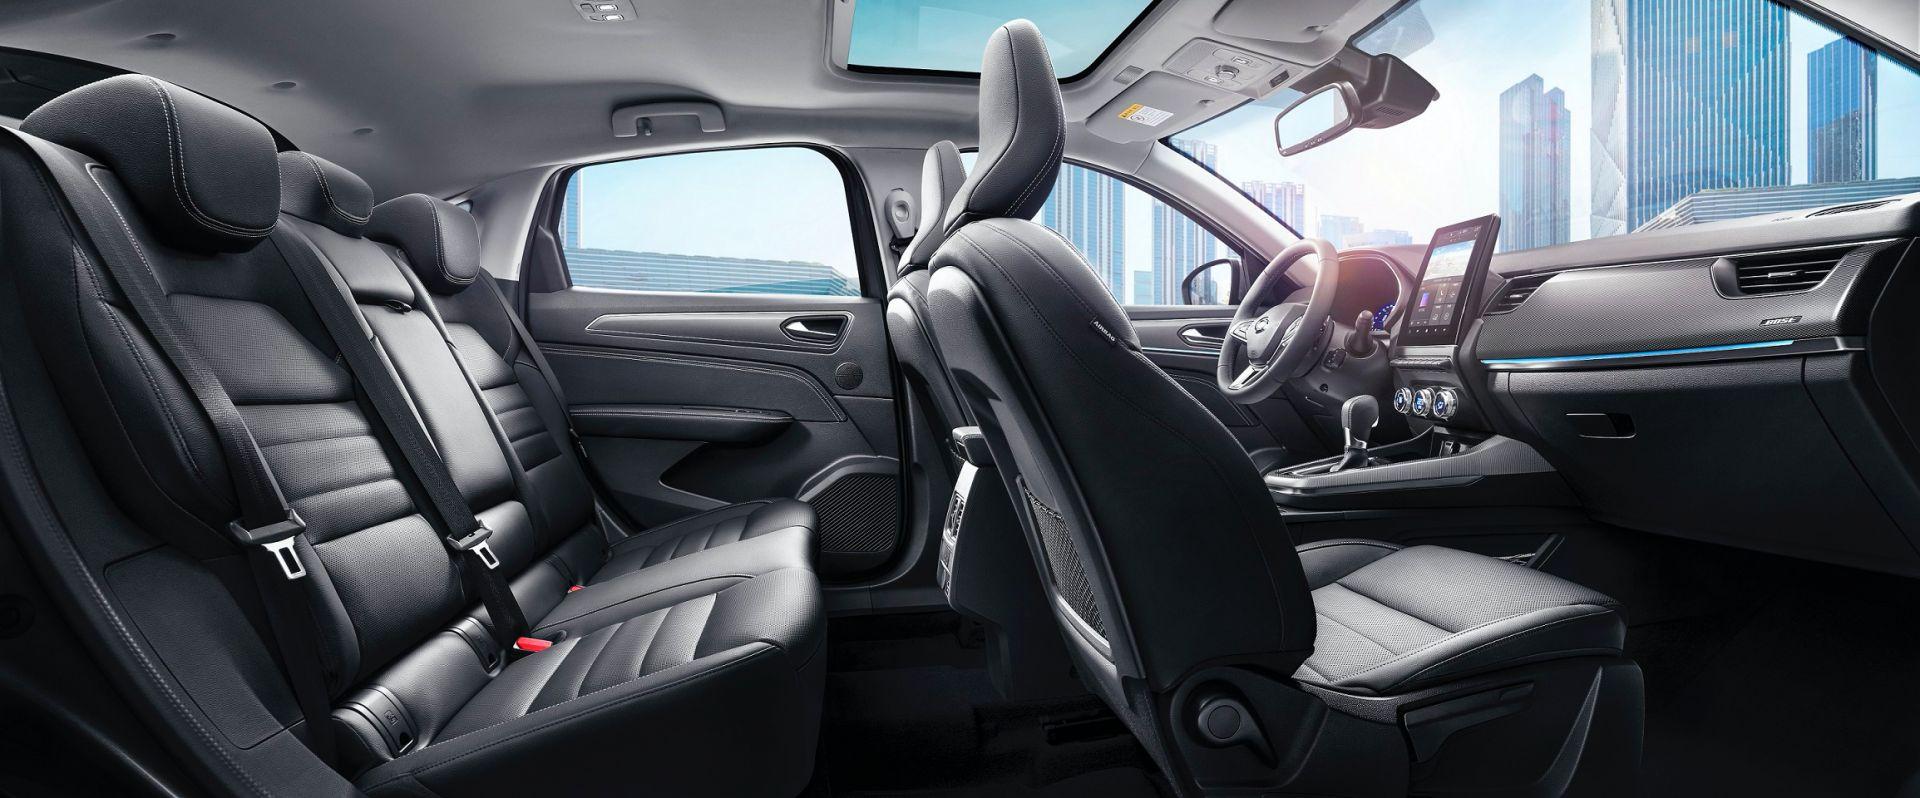 Renault_Samsung_XM3_0003